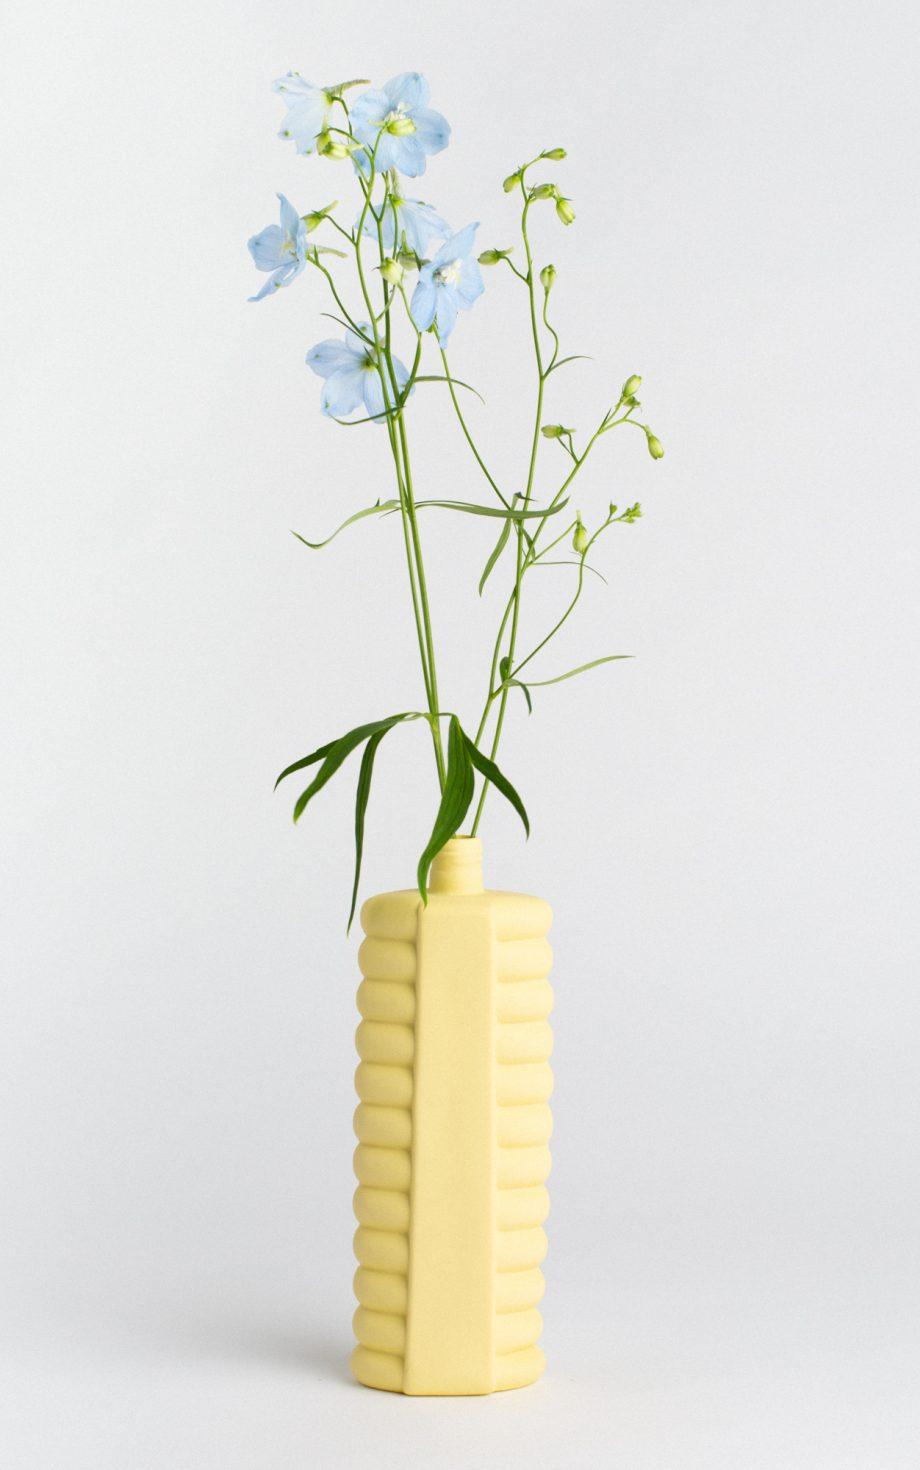 bottle vase #11 fresh yellow